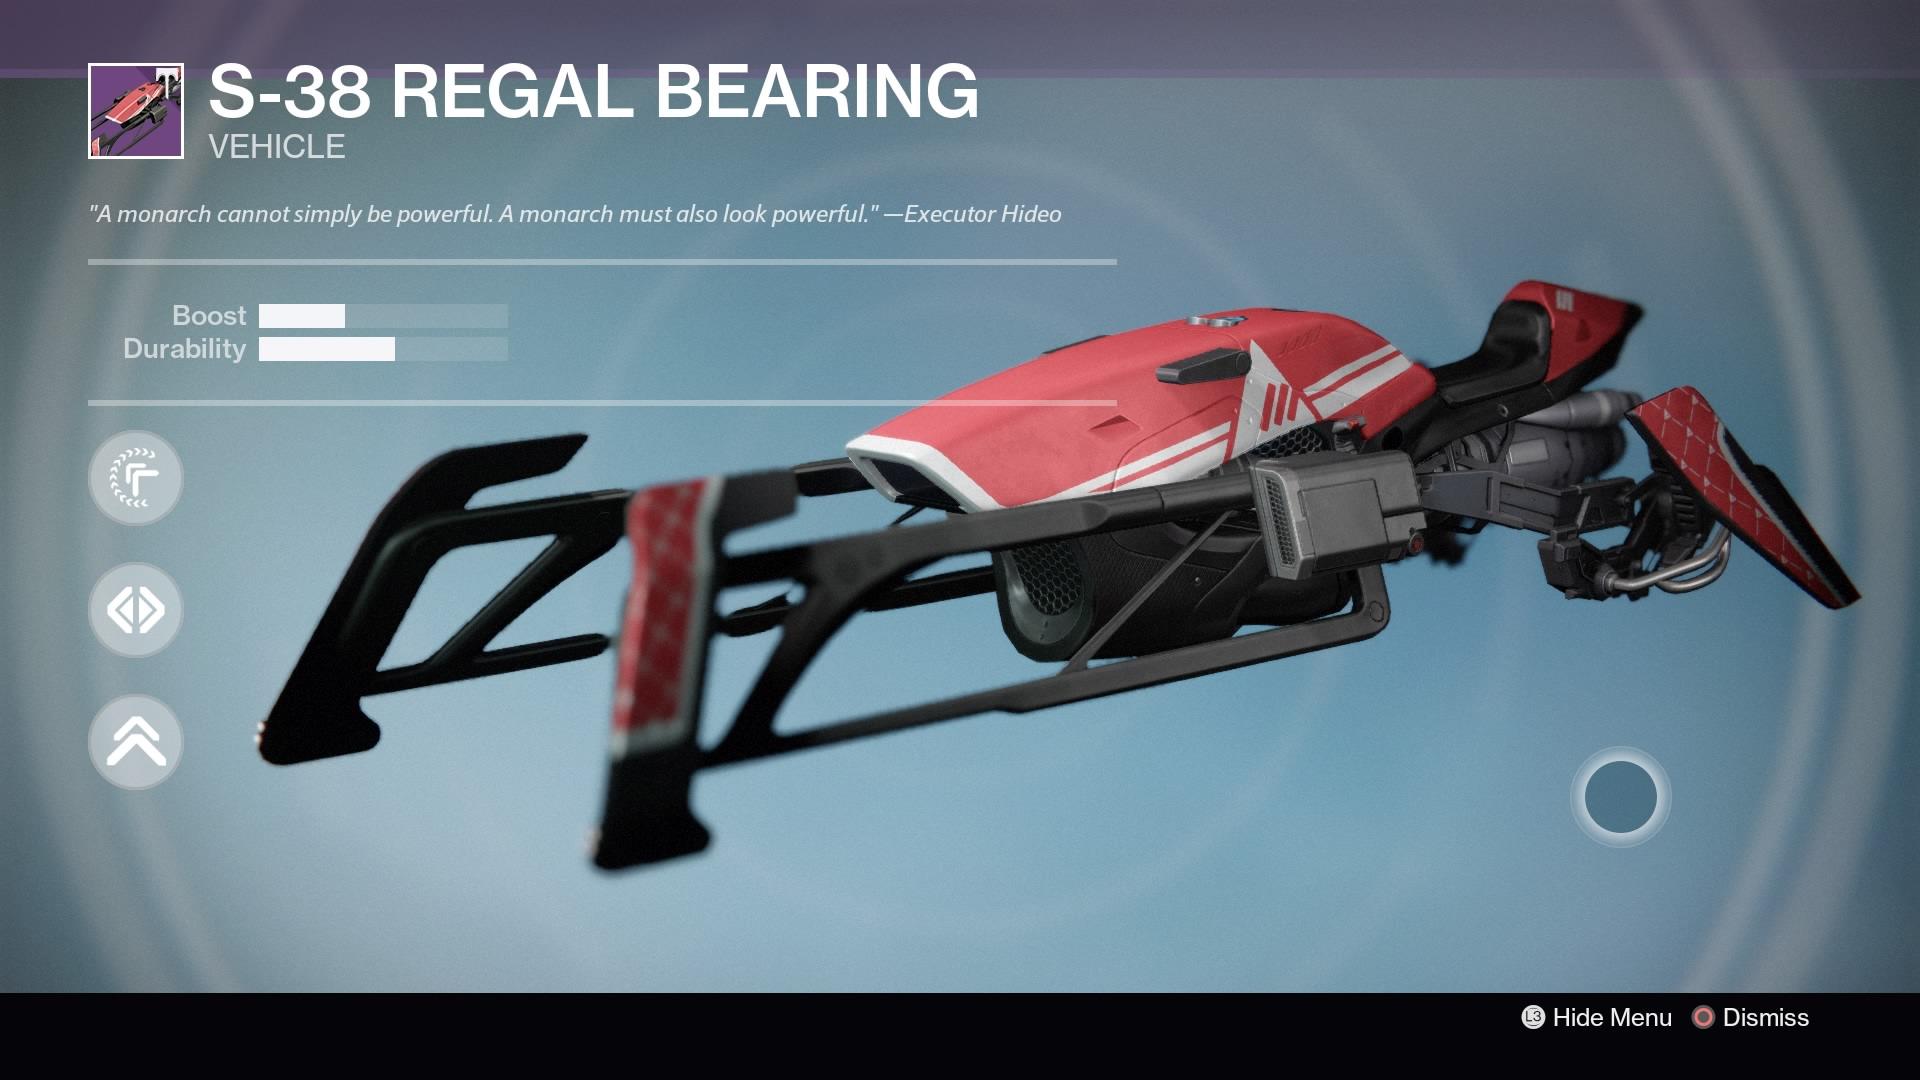 S-38 Regal Bearing